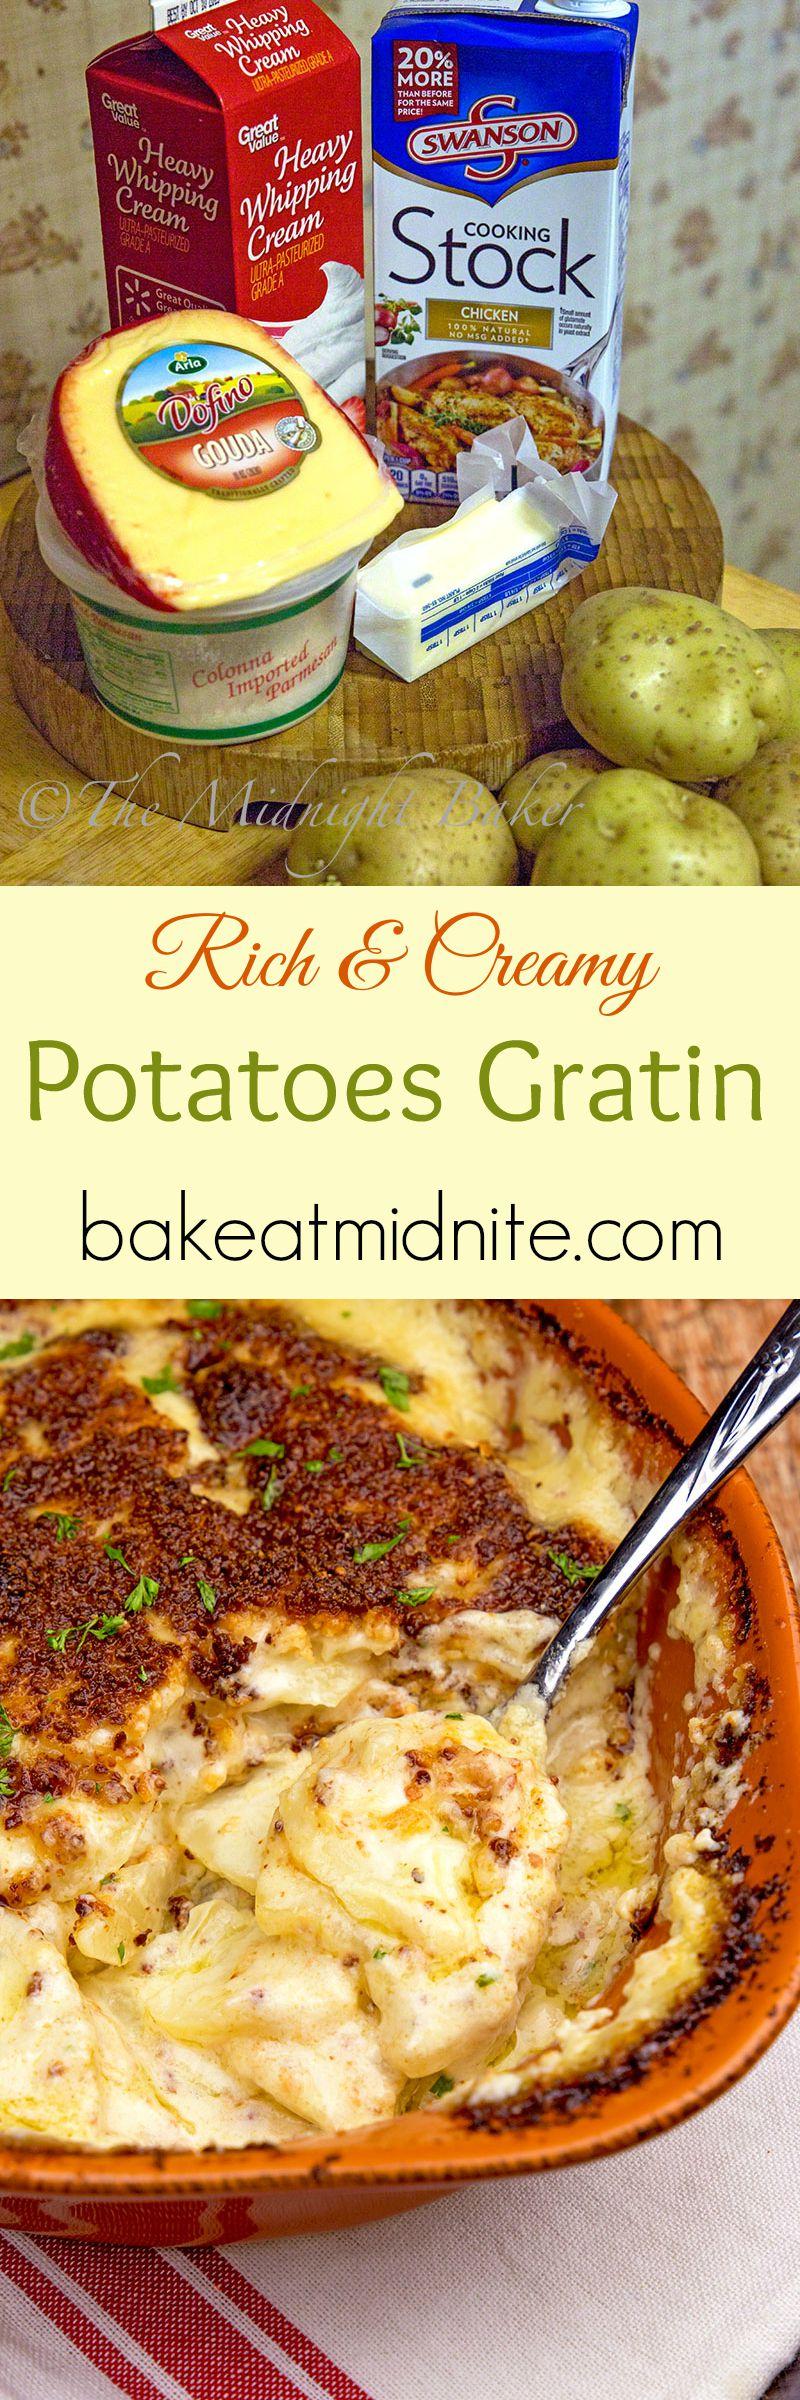 Scalloped-Potatoes-Gratin